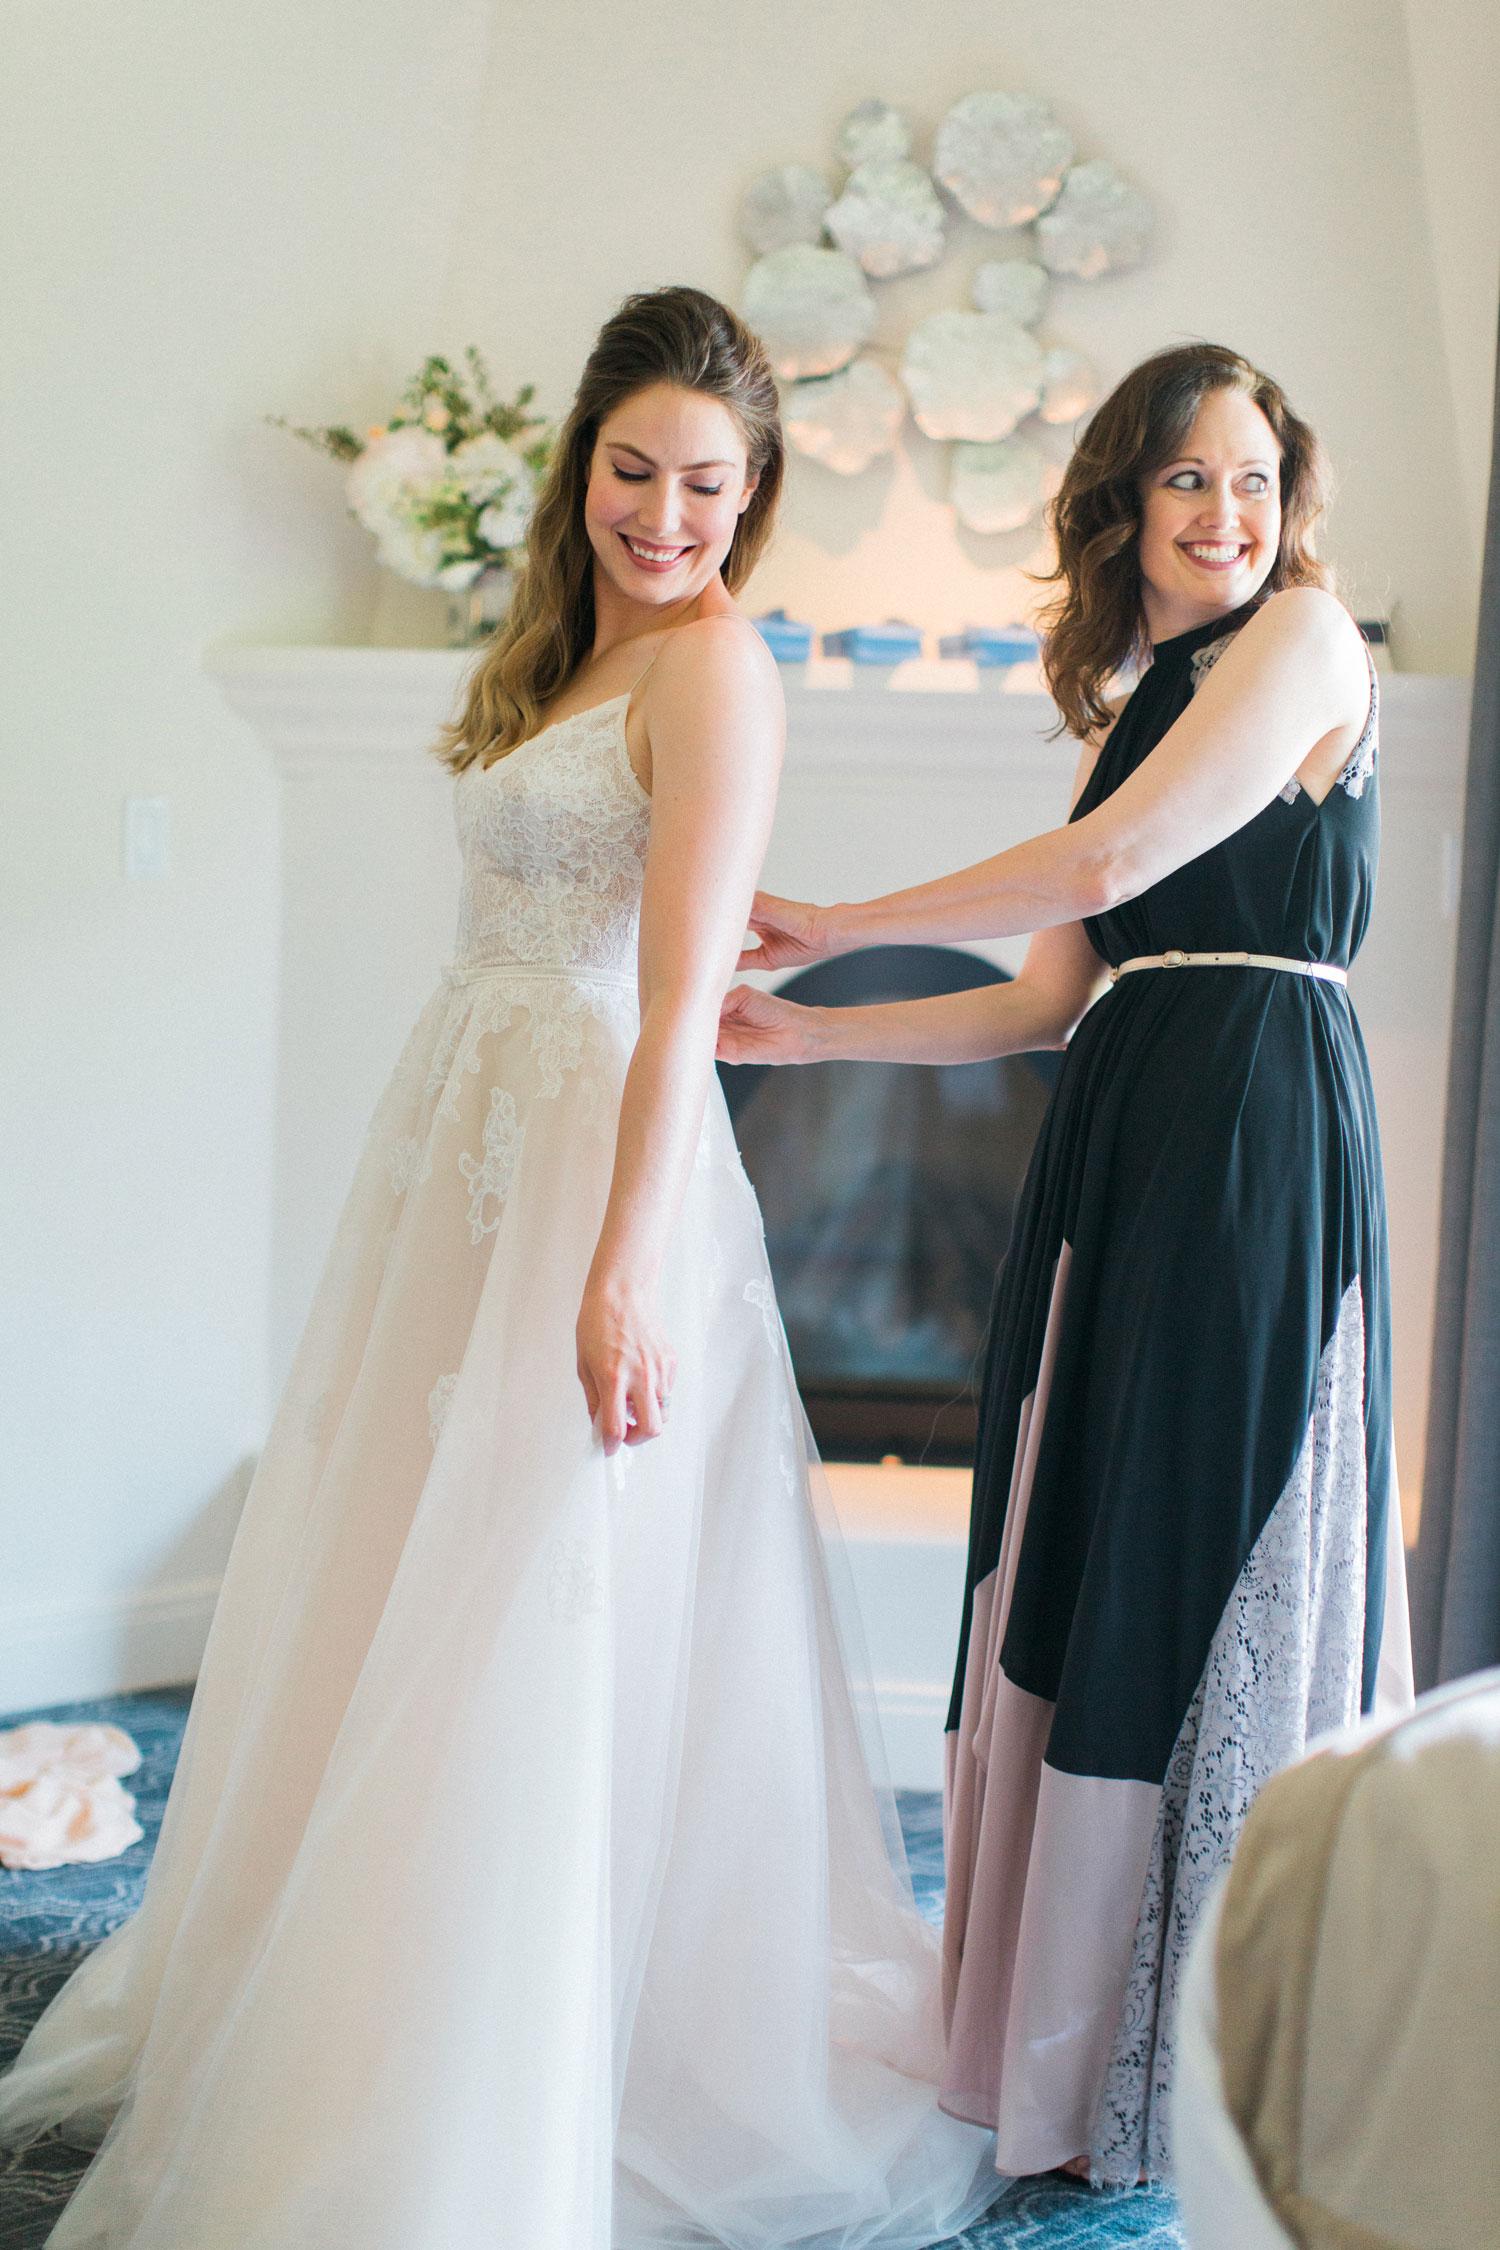 Maradee Wahl of Dear Maradee helping bride on wedding day bridal stylist duties